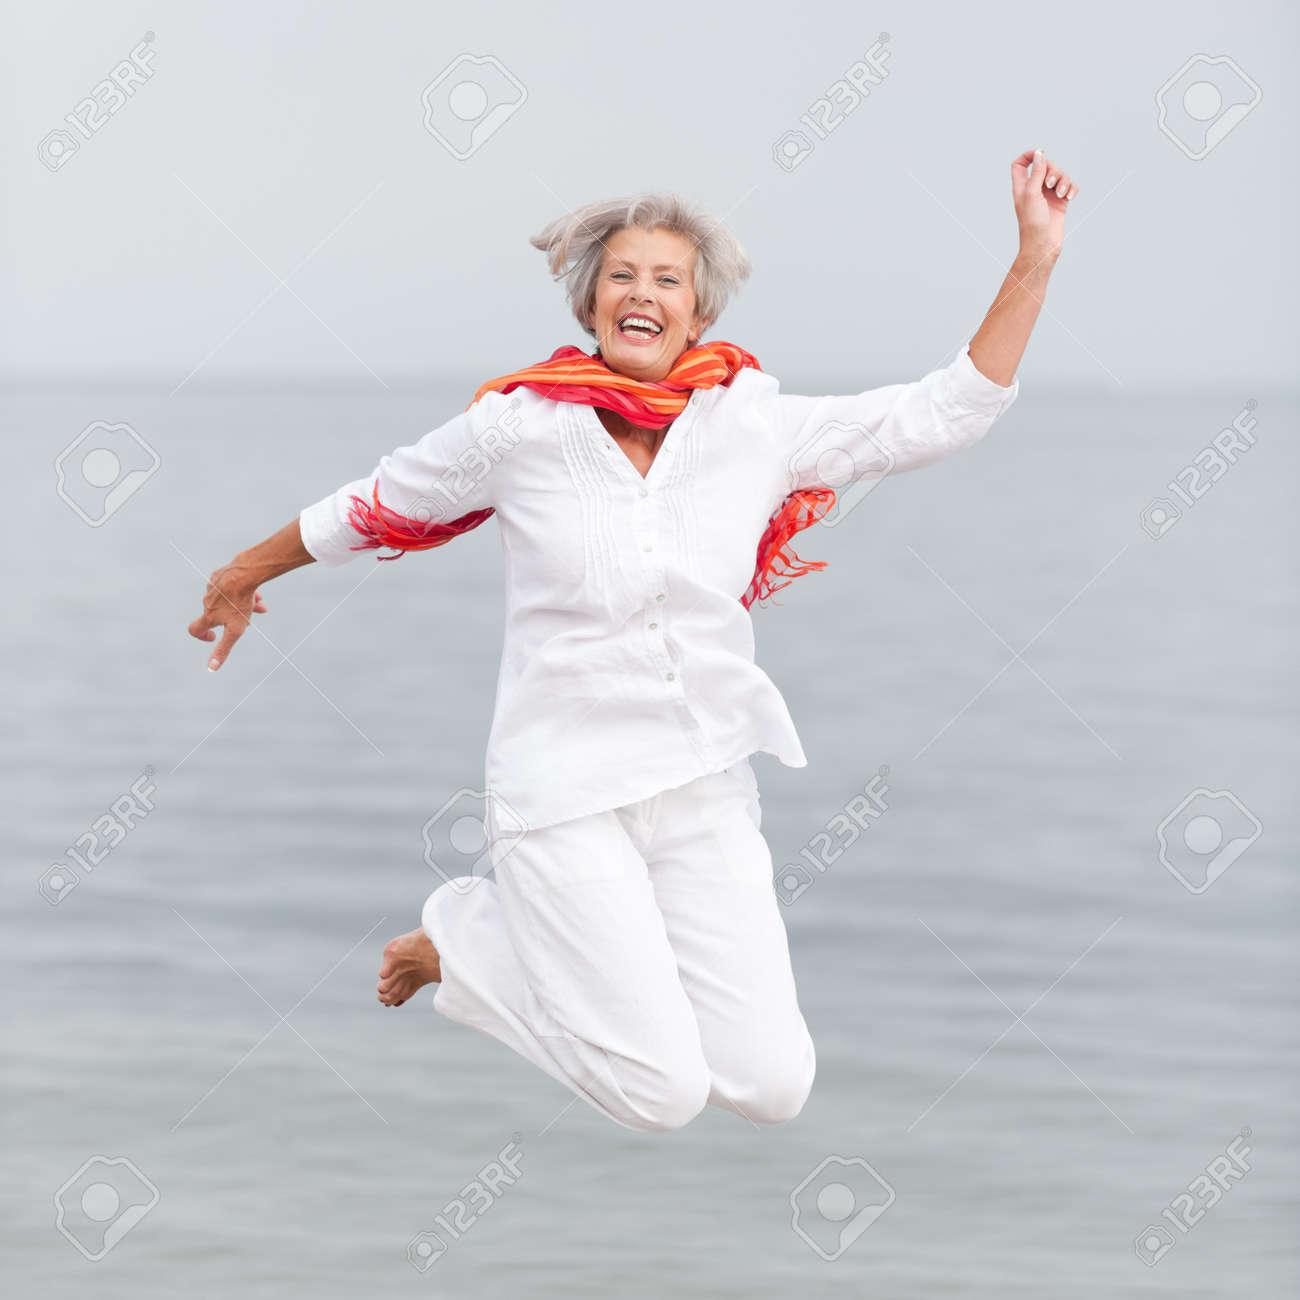 Active and happy senior woman Stock Photo - 13310163